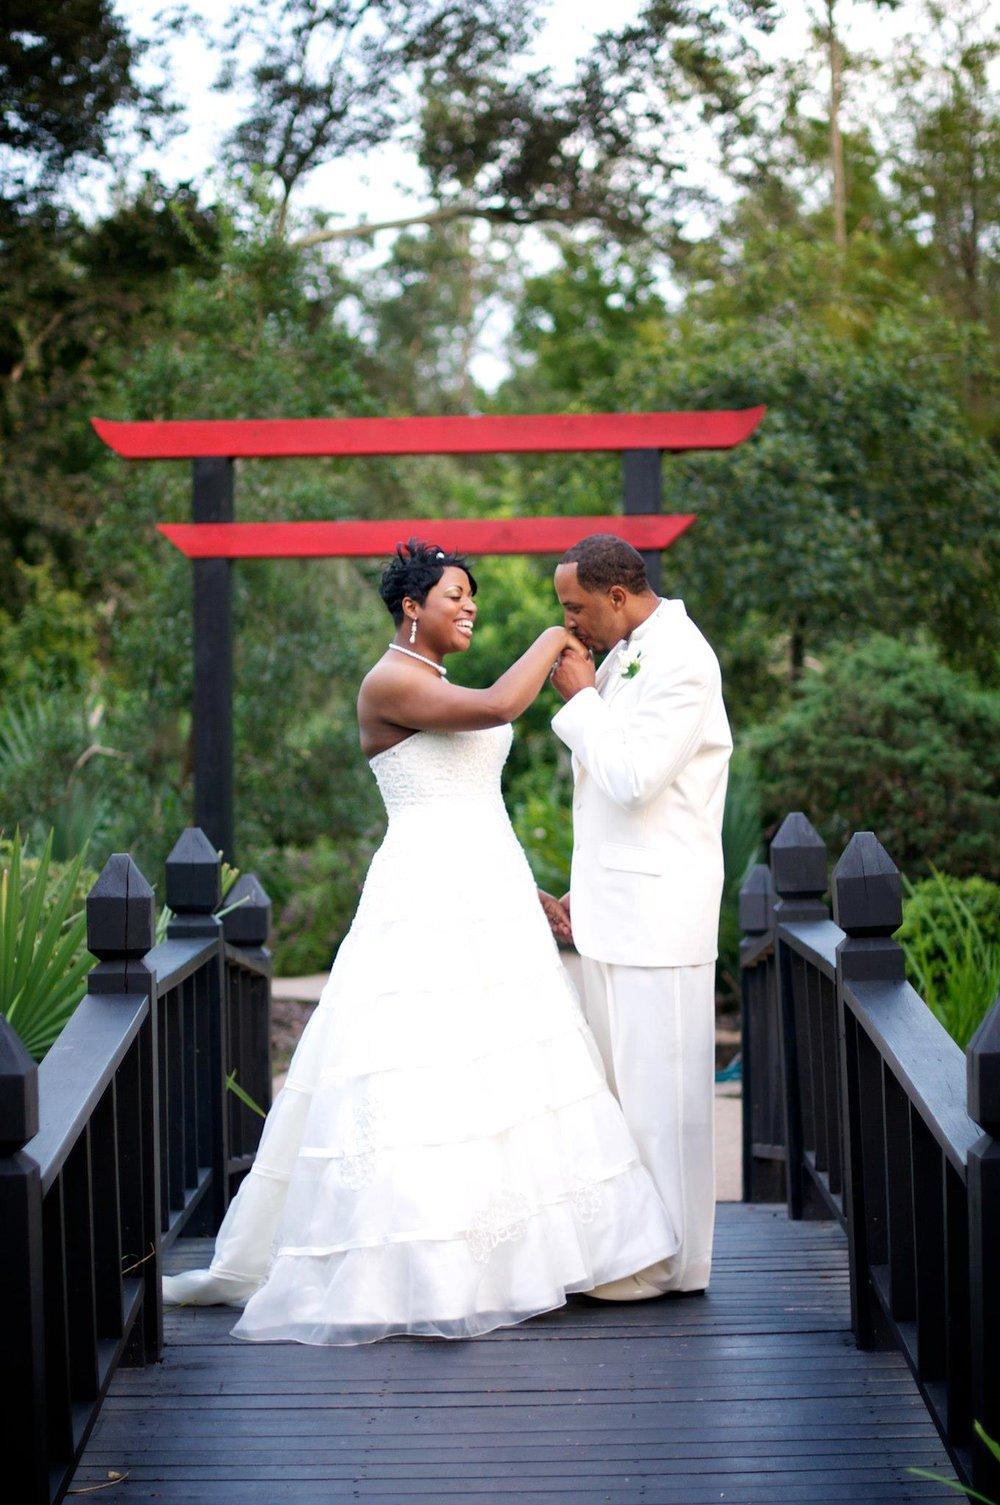 gauthier wedding 1.jpg